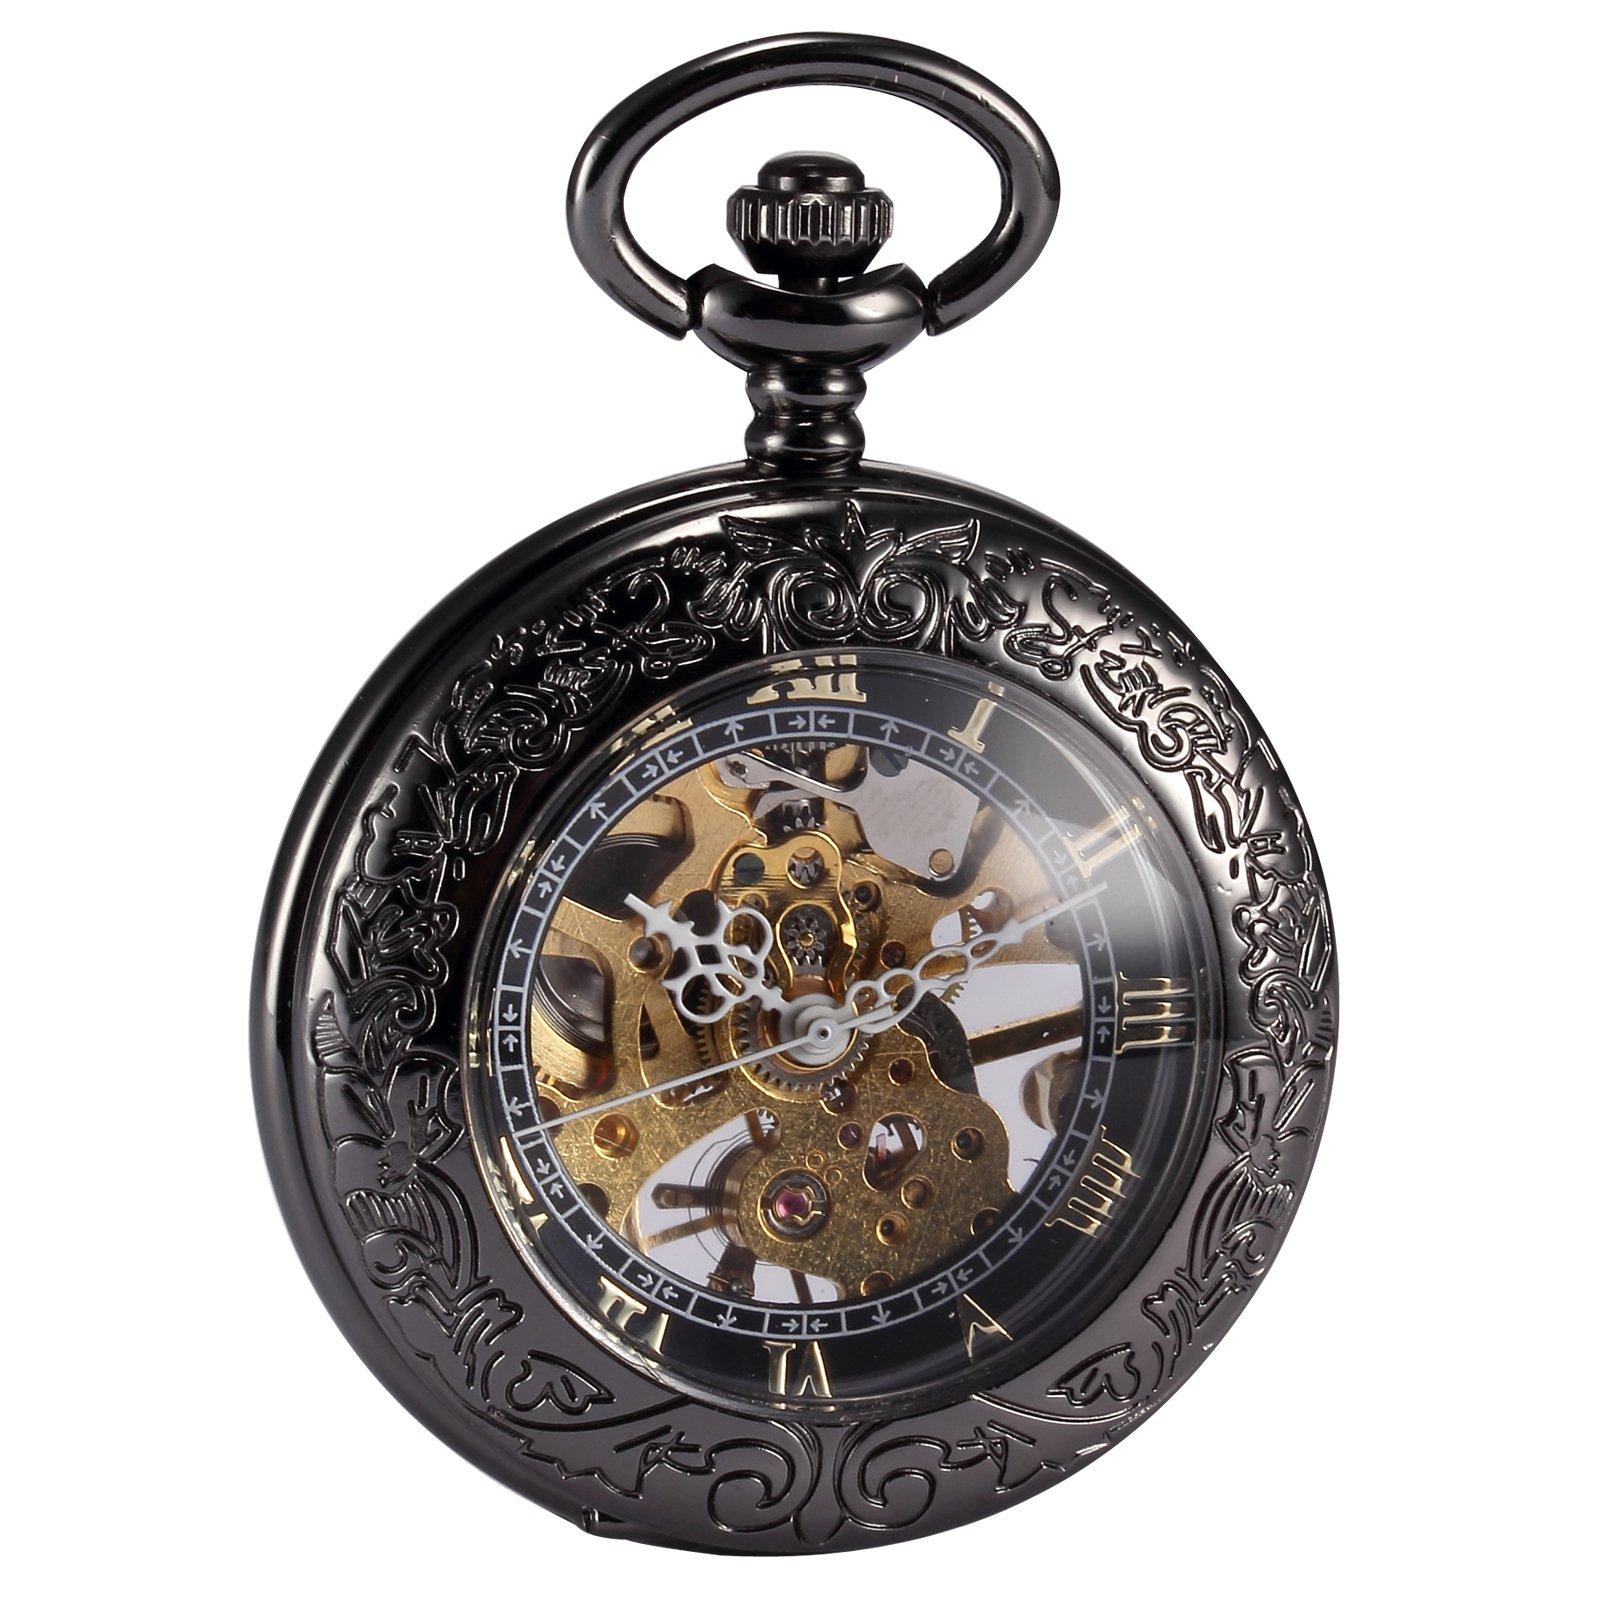 Superior AMPM24 WPK164 U2013 Pocket Watch, Black